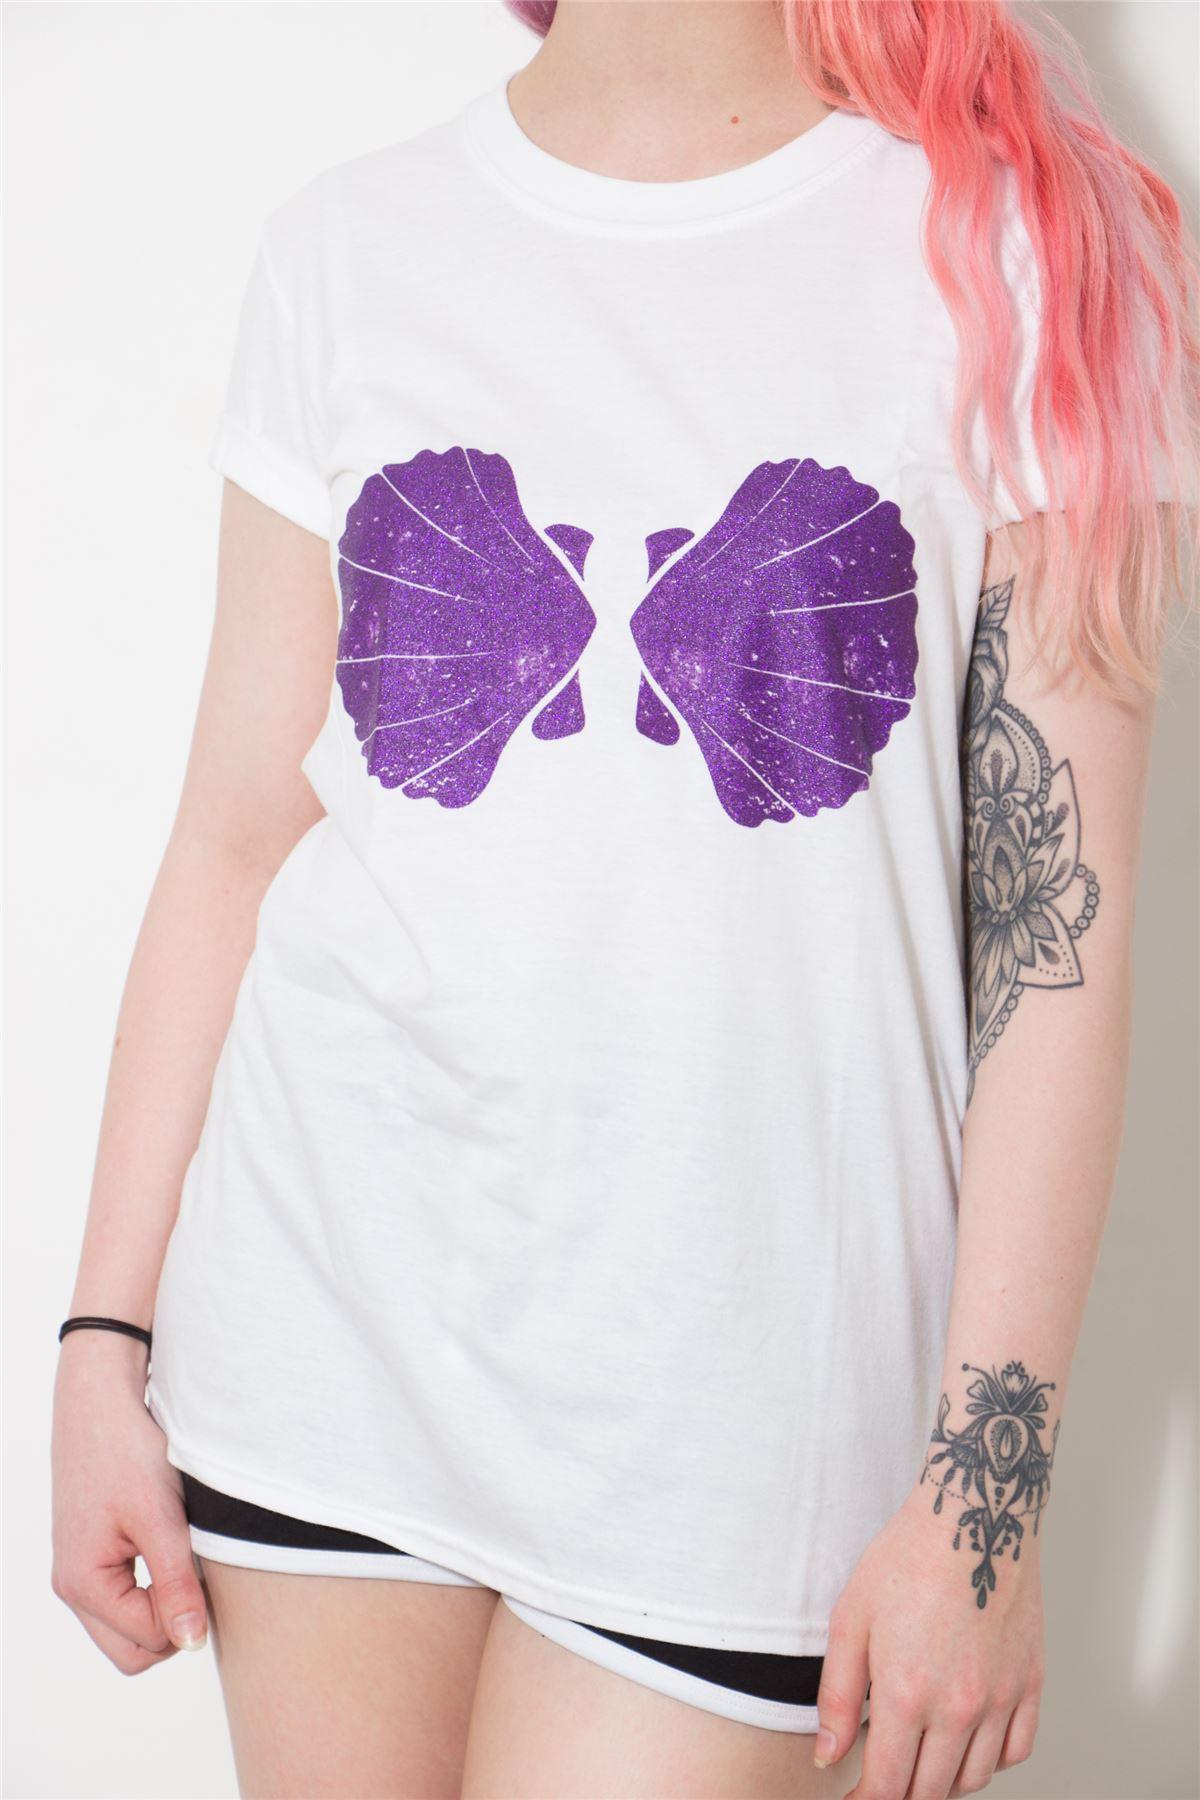 ef1d0e0169a2b Twisted Mermaid Shell T Shirt Top Ariel Bikini Bra Emo Goth Punk ...